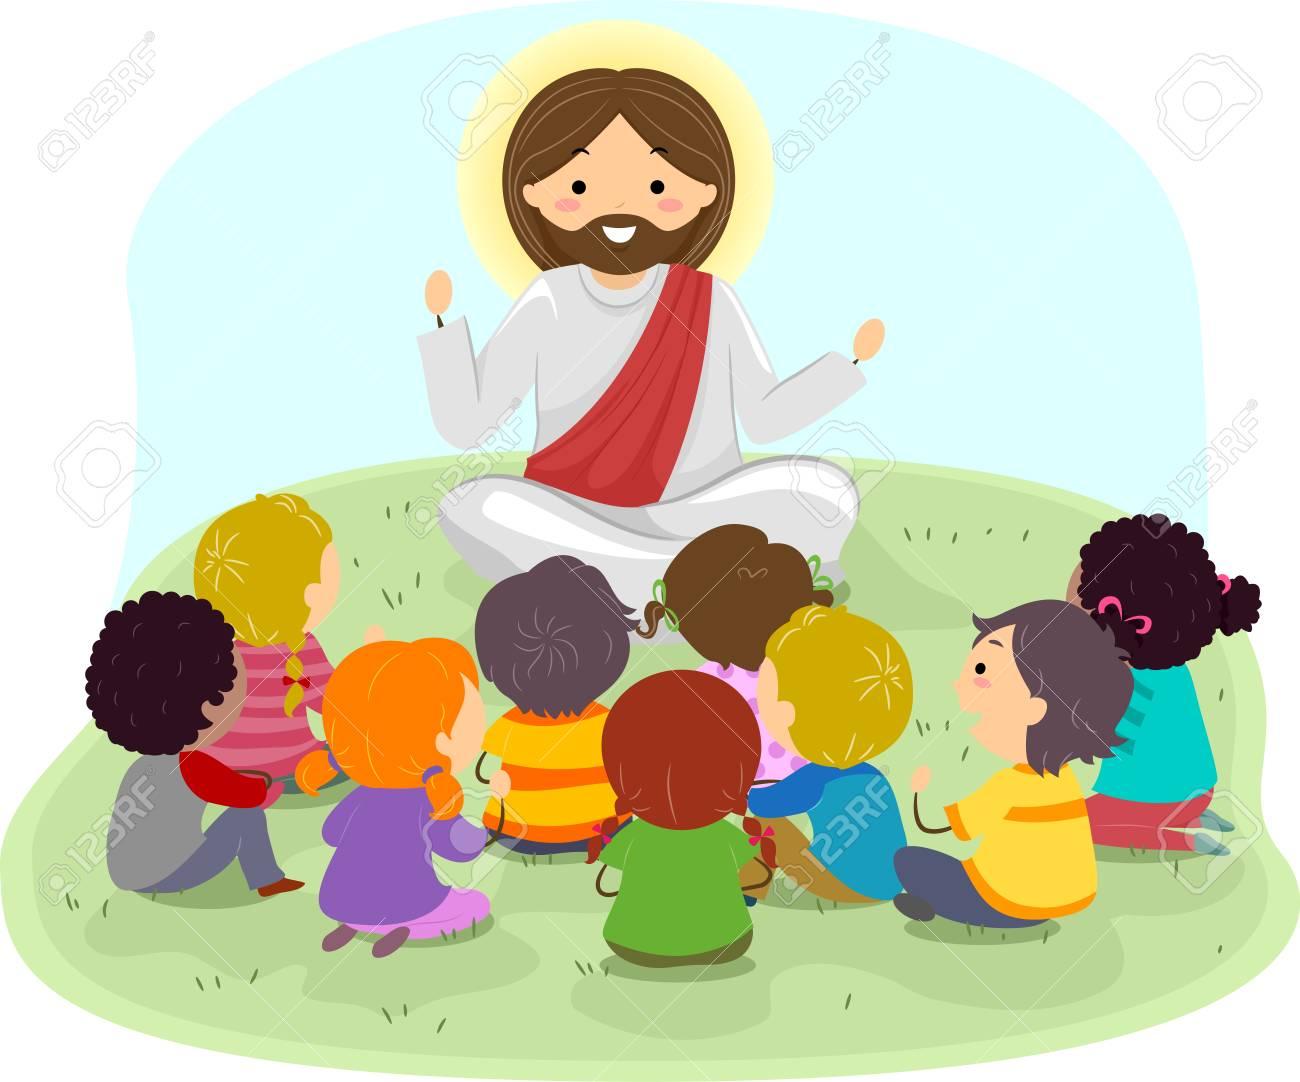 Illustration of Stickman Kids Listening to Jesus Christ Preaching Outdoors - 88561352